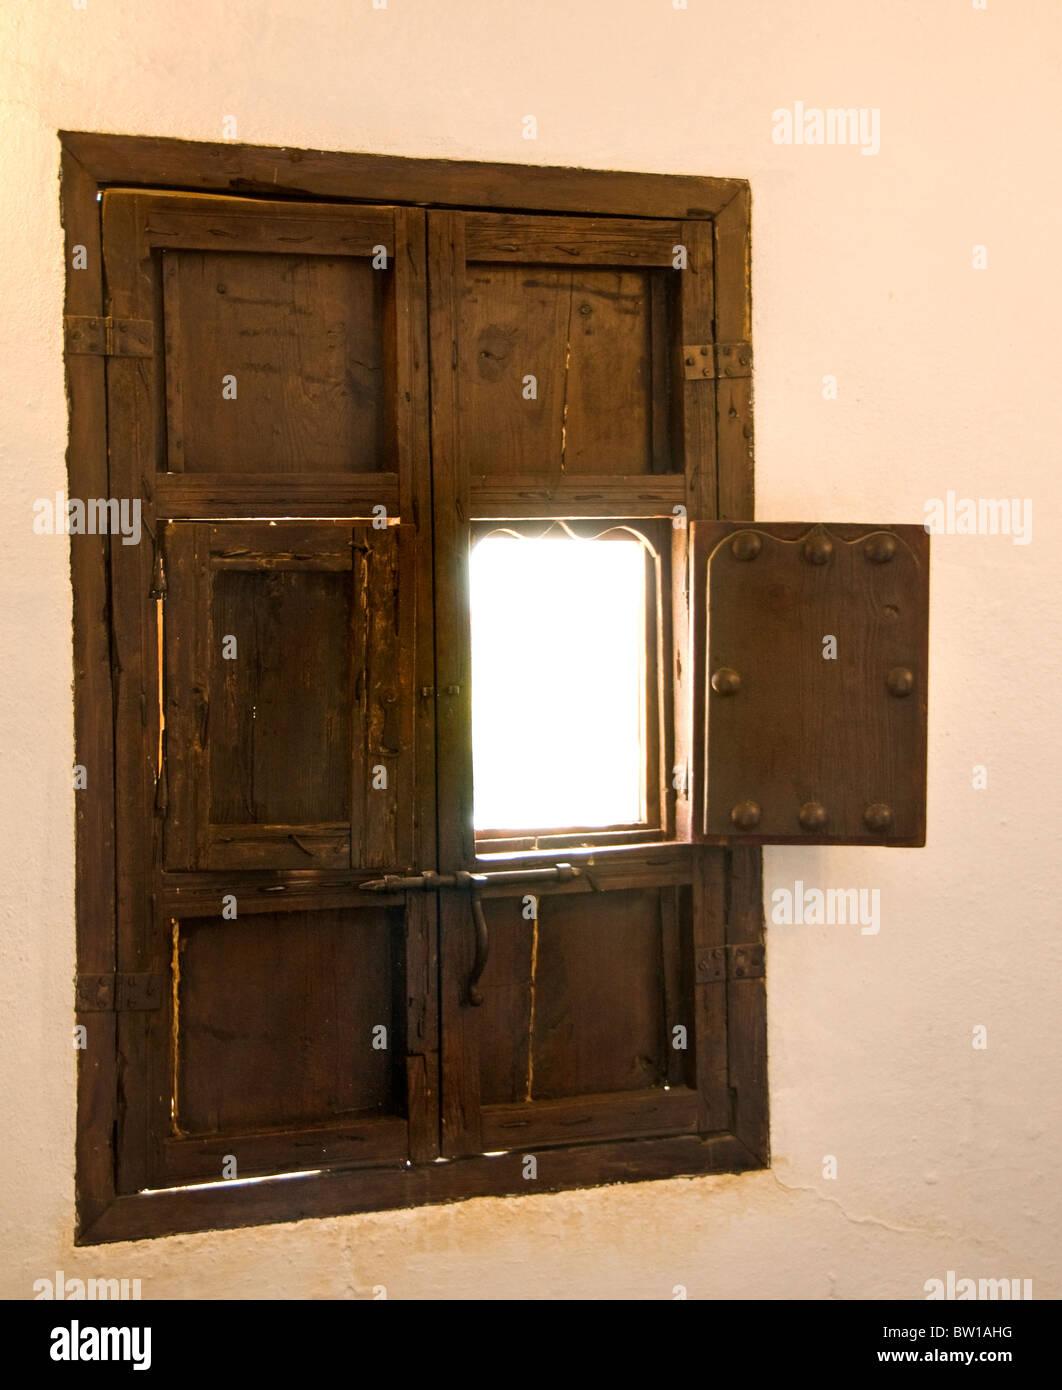 Spain Andalusia Spanish old  farm farmstead  window - Stock Image